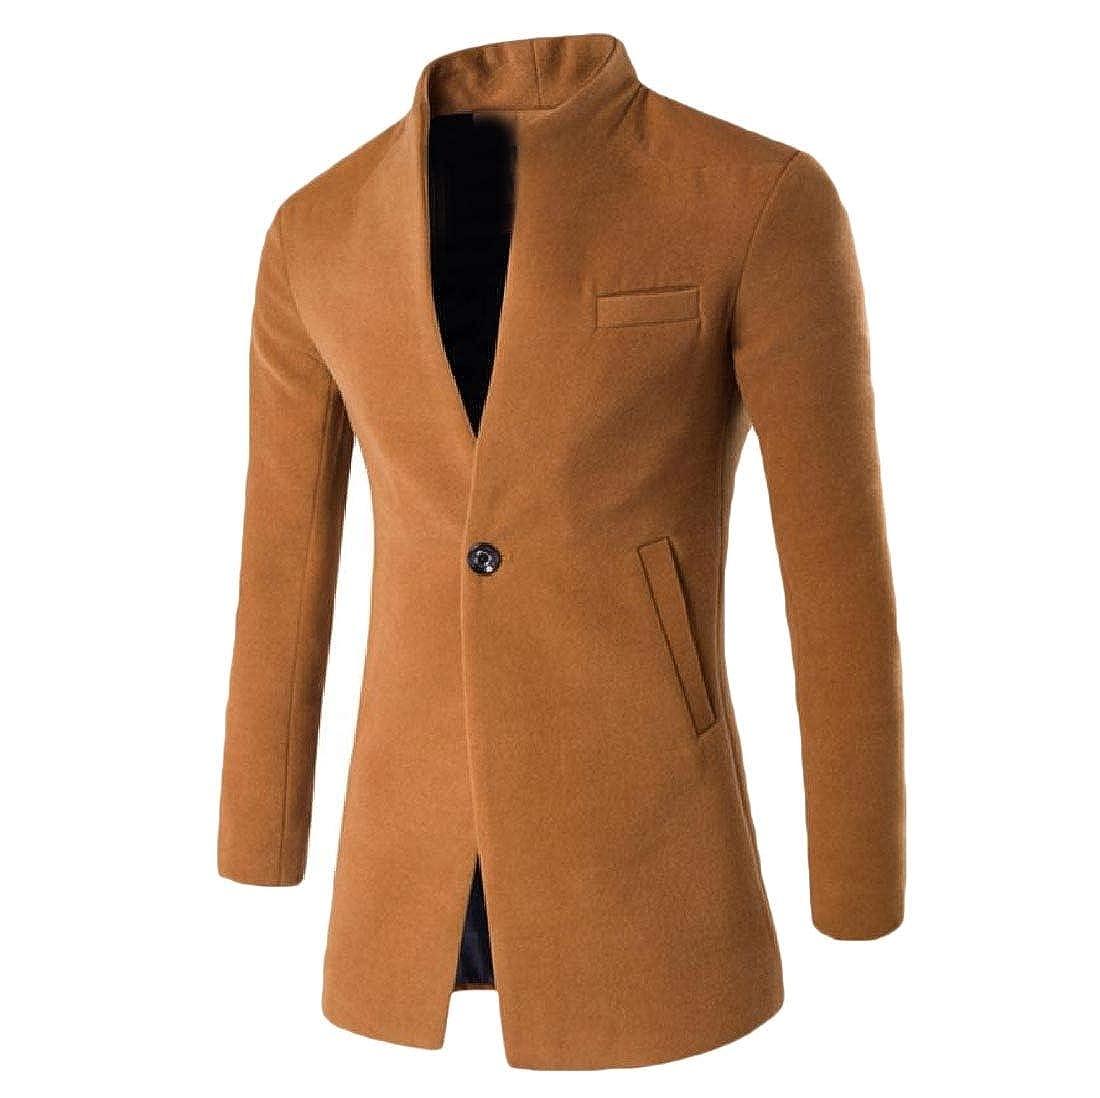 Khaki Vska Mens Wool 1 Button Topcoat Outwear Mandarin Collar Peacoat